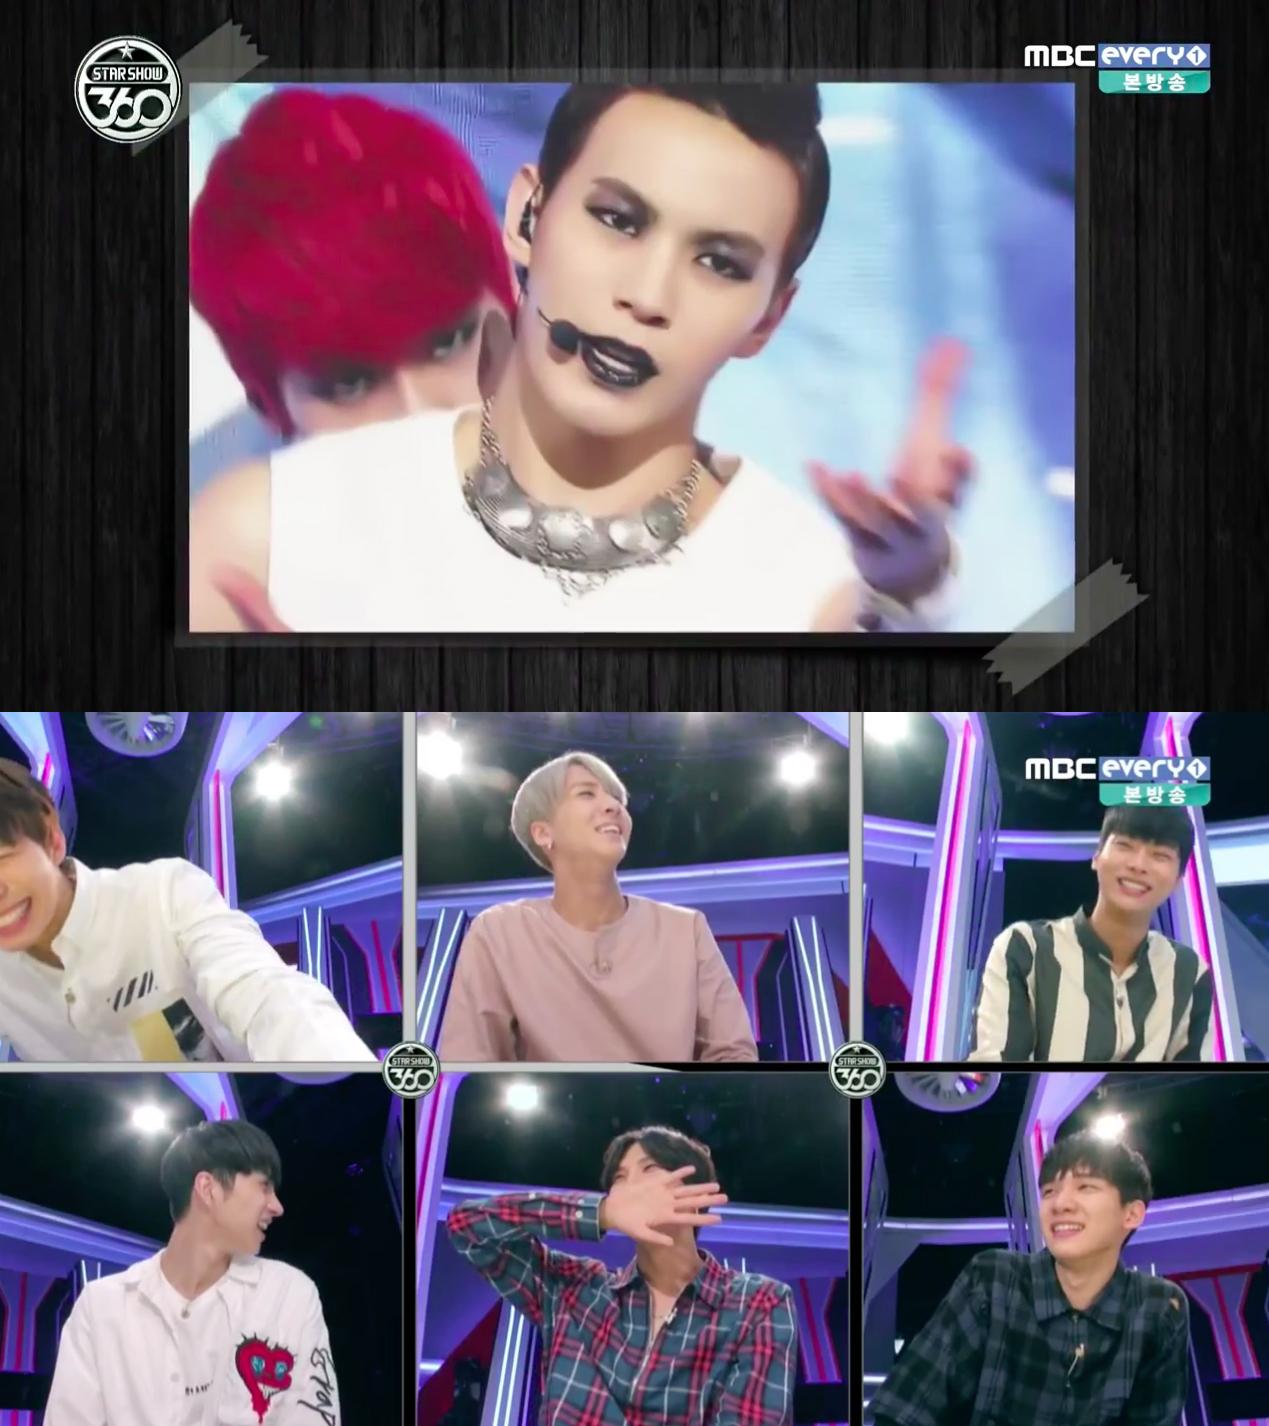 vixx star show 3